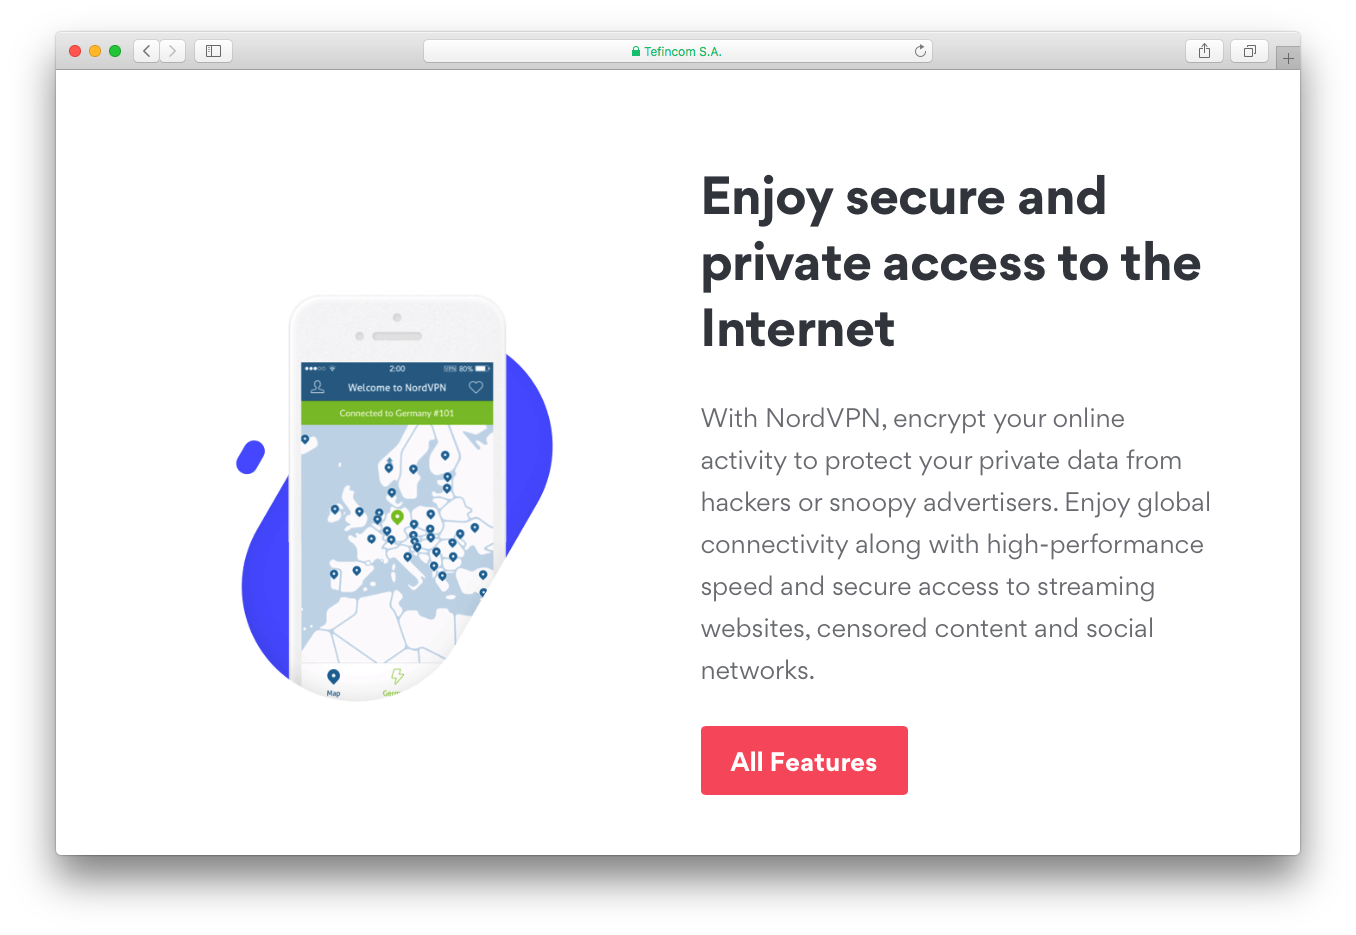 NordVPN secure private internet access encrypt online activity data